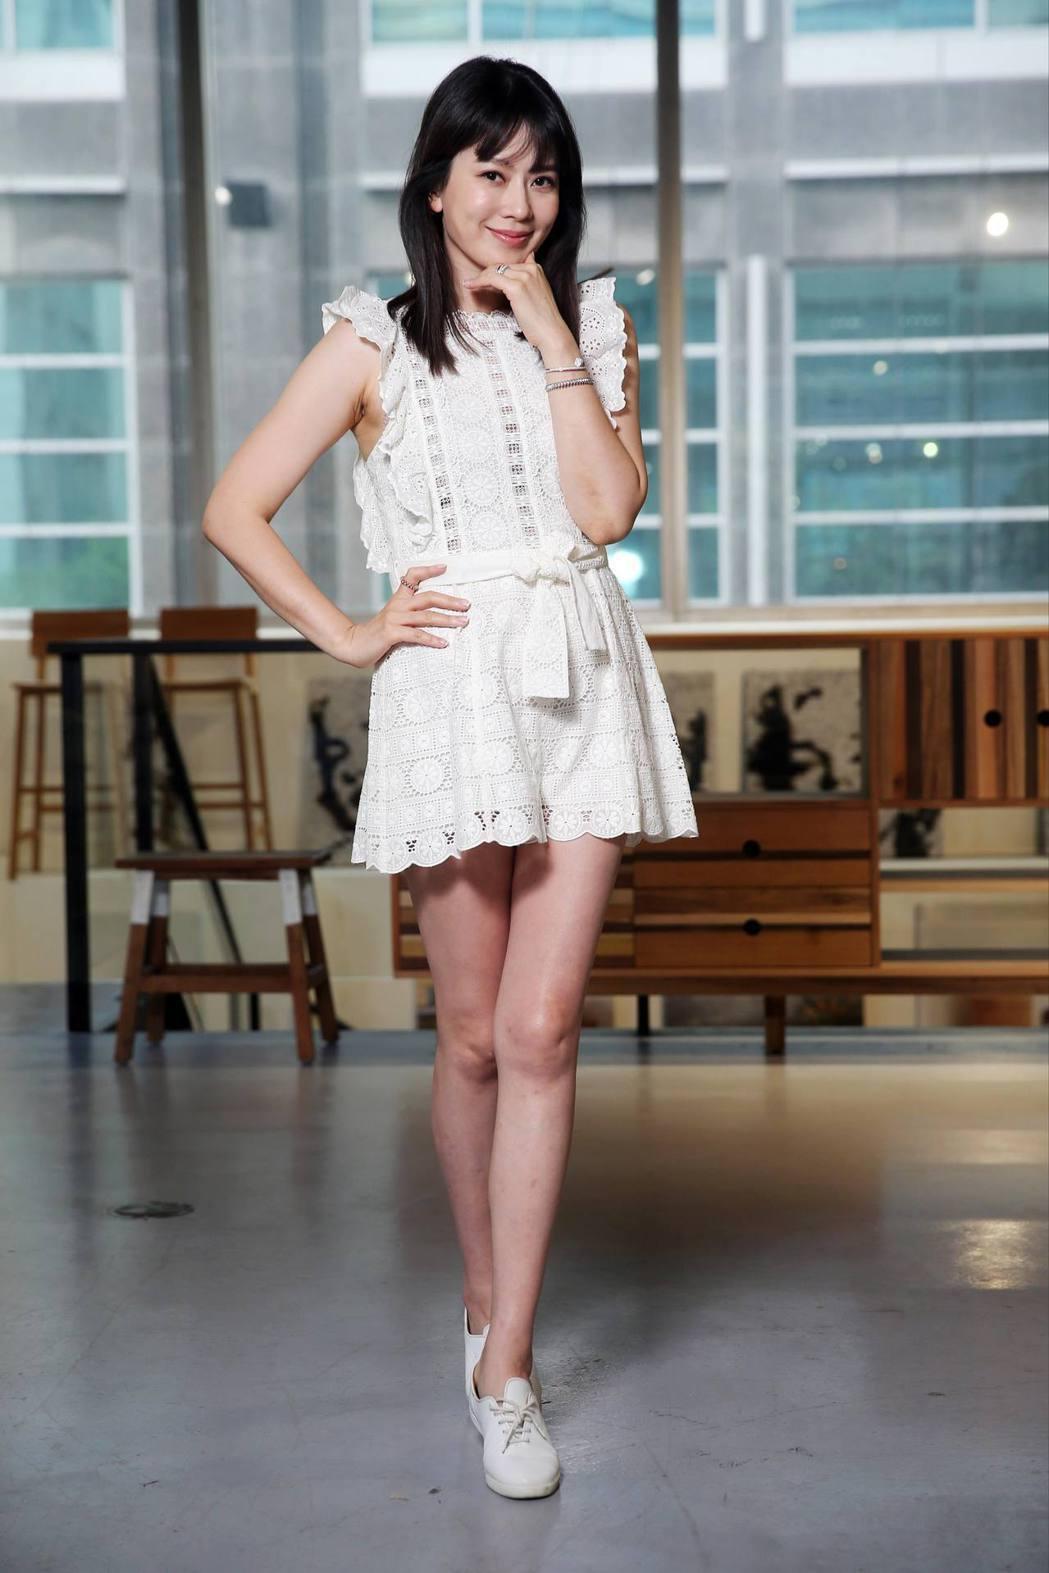 Melody如今是時尚媽咪,對流行文化很有看法。記者徐兆玄/攝影